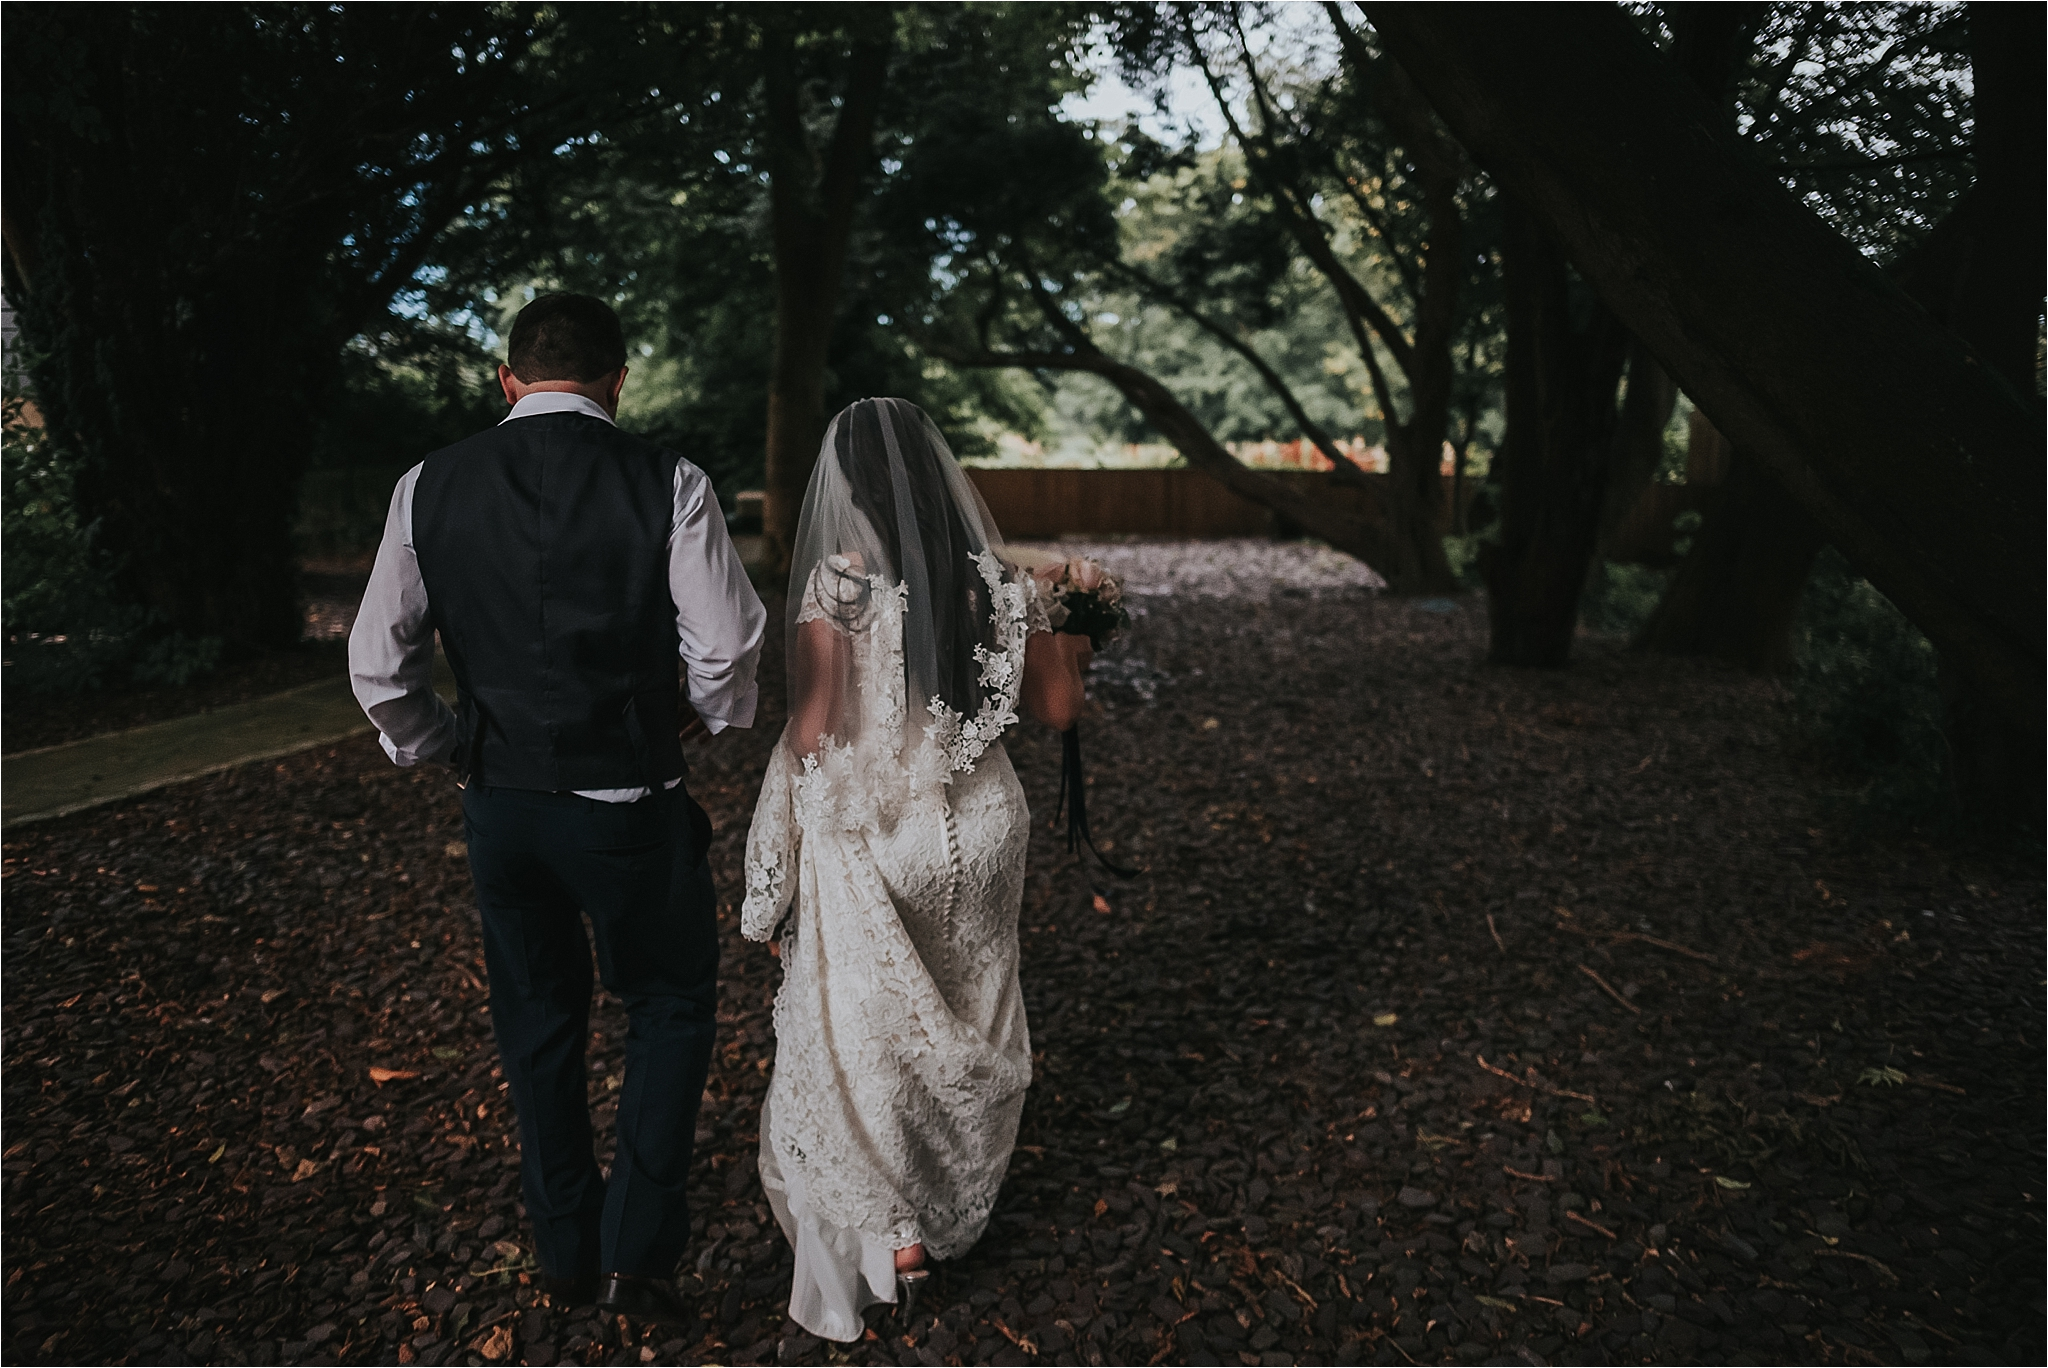 thevilla+lancashire+wreagreen+wedding+photographer111.jpg